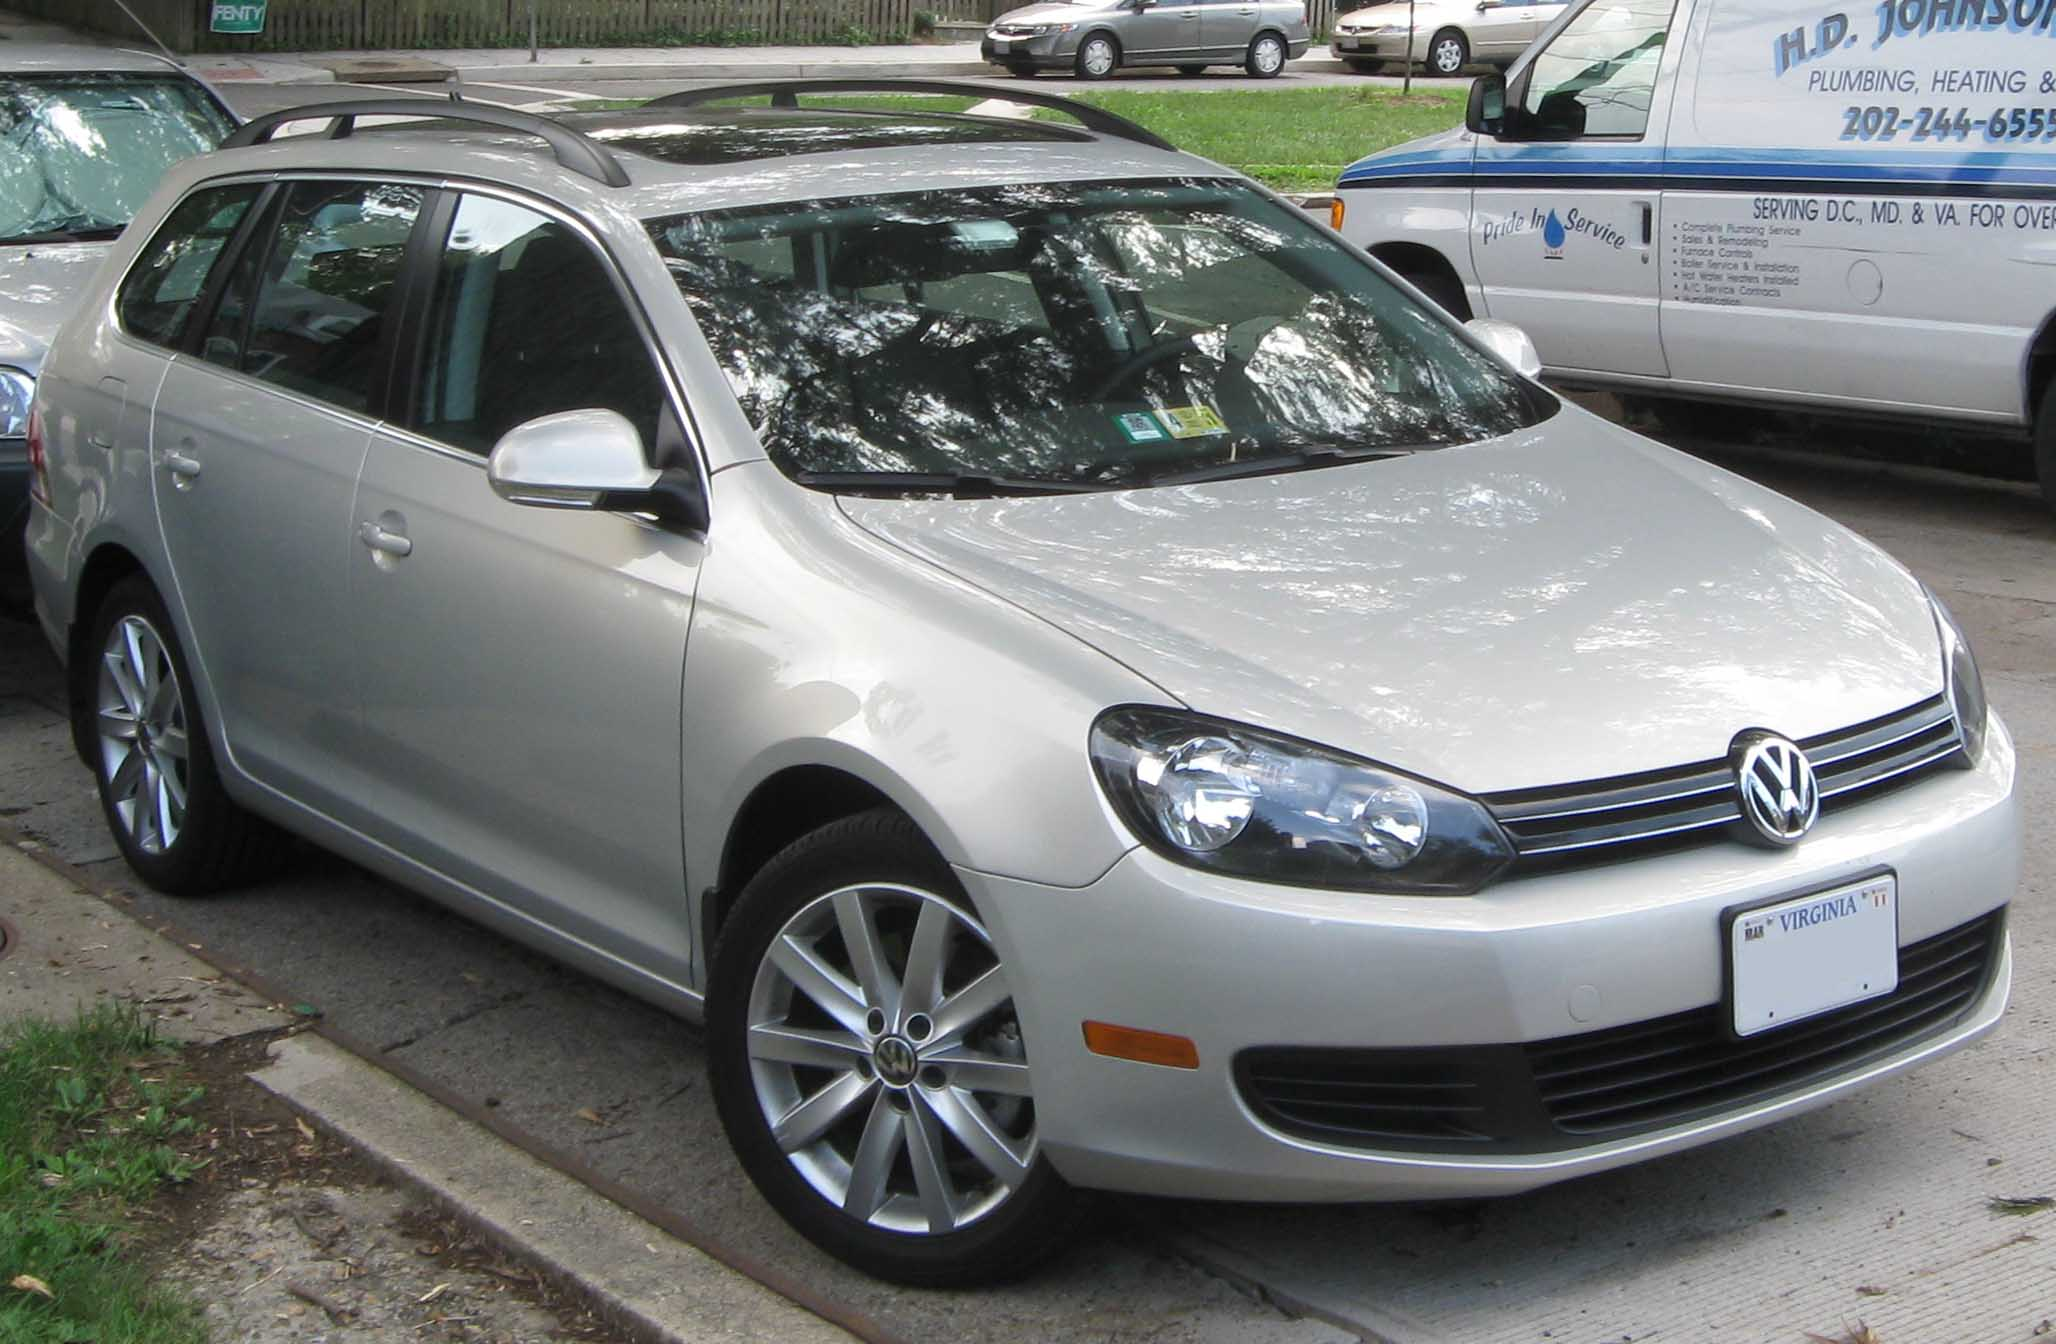 File:2010 Volkswagen Jetta TDI Sportwagen -- 07-15-2010 1 ...